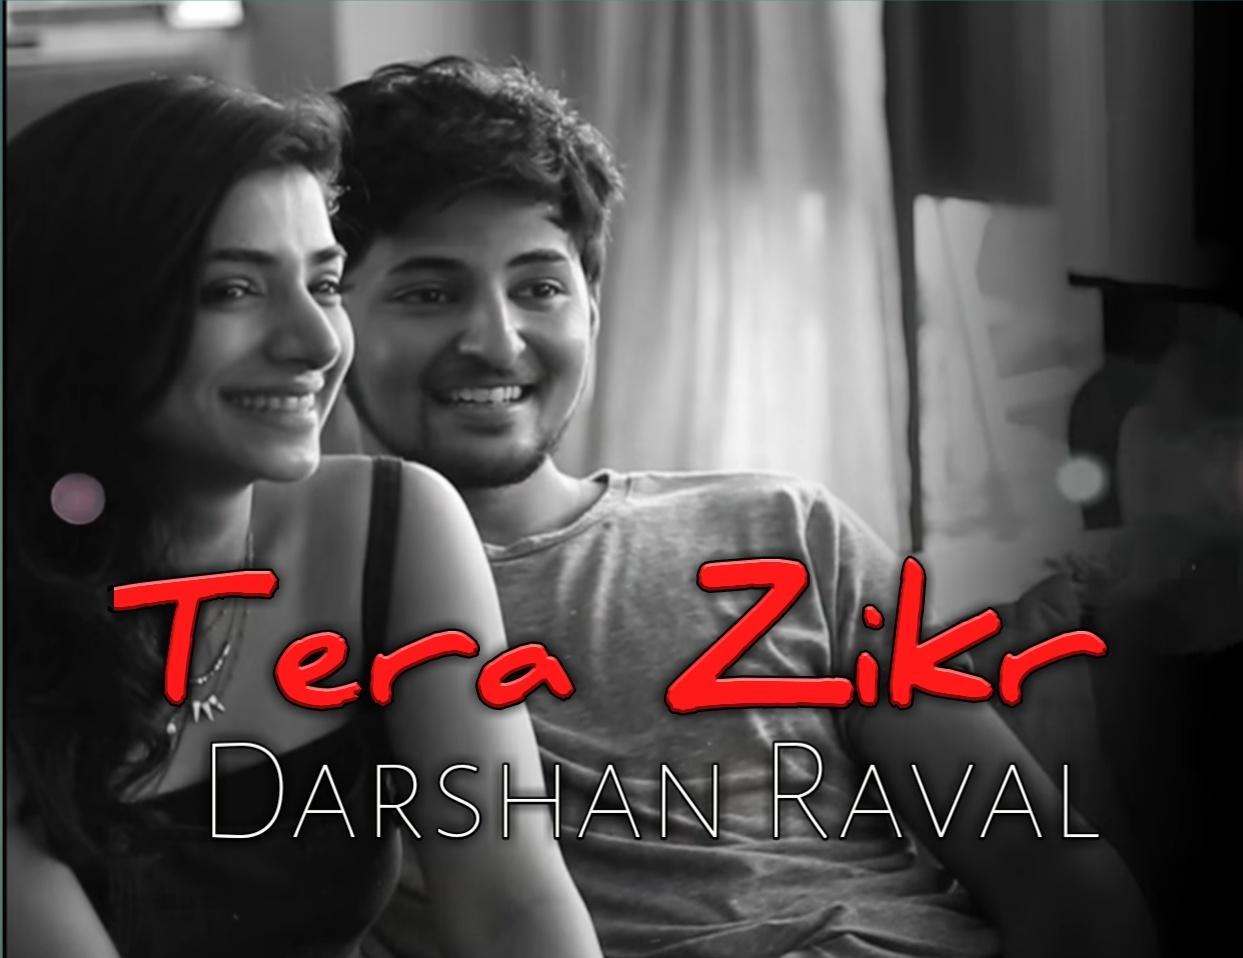 Tera Zikr Guitar Chords Darshan Raval Tgtutorials